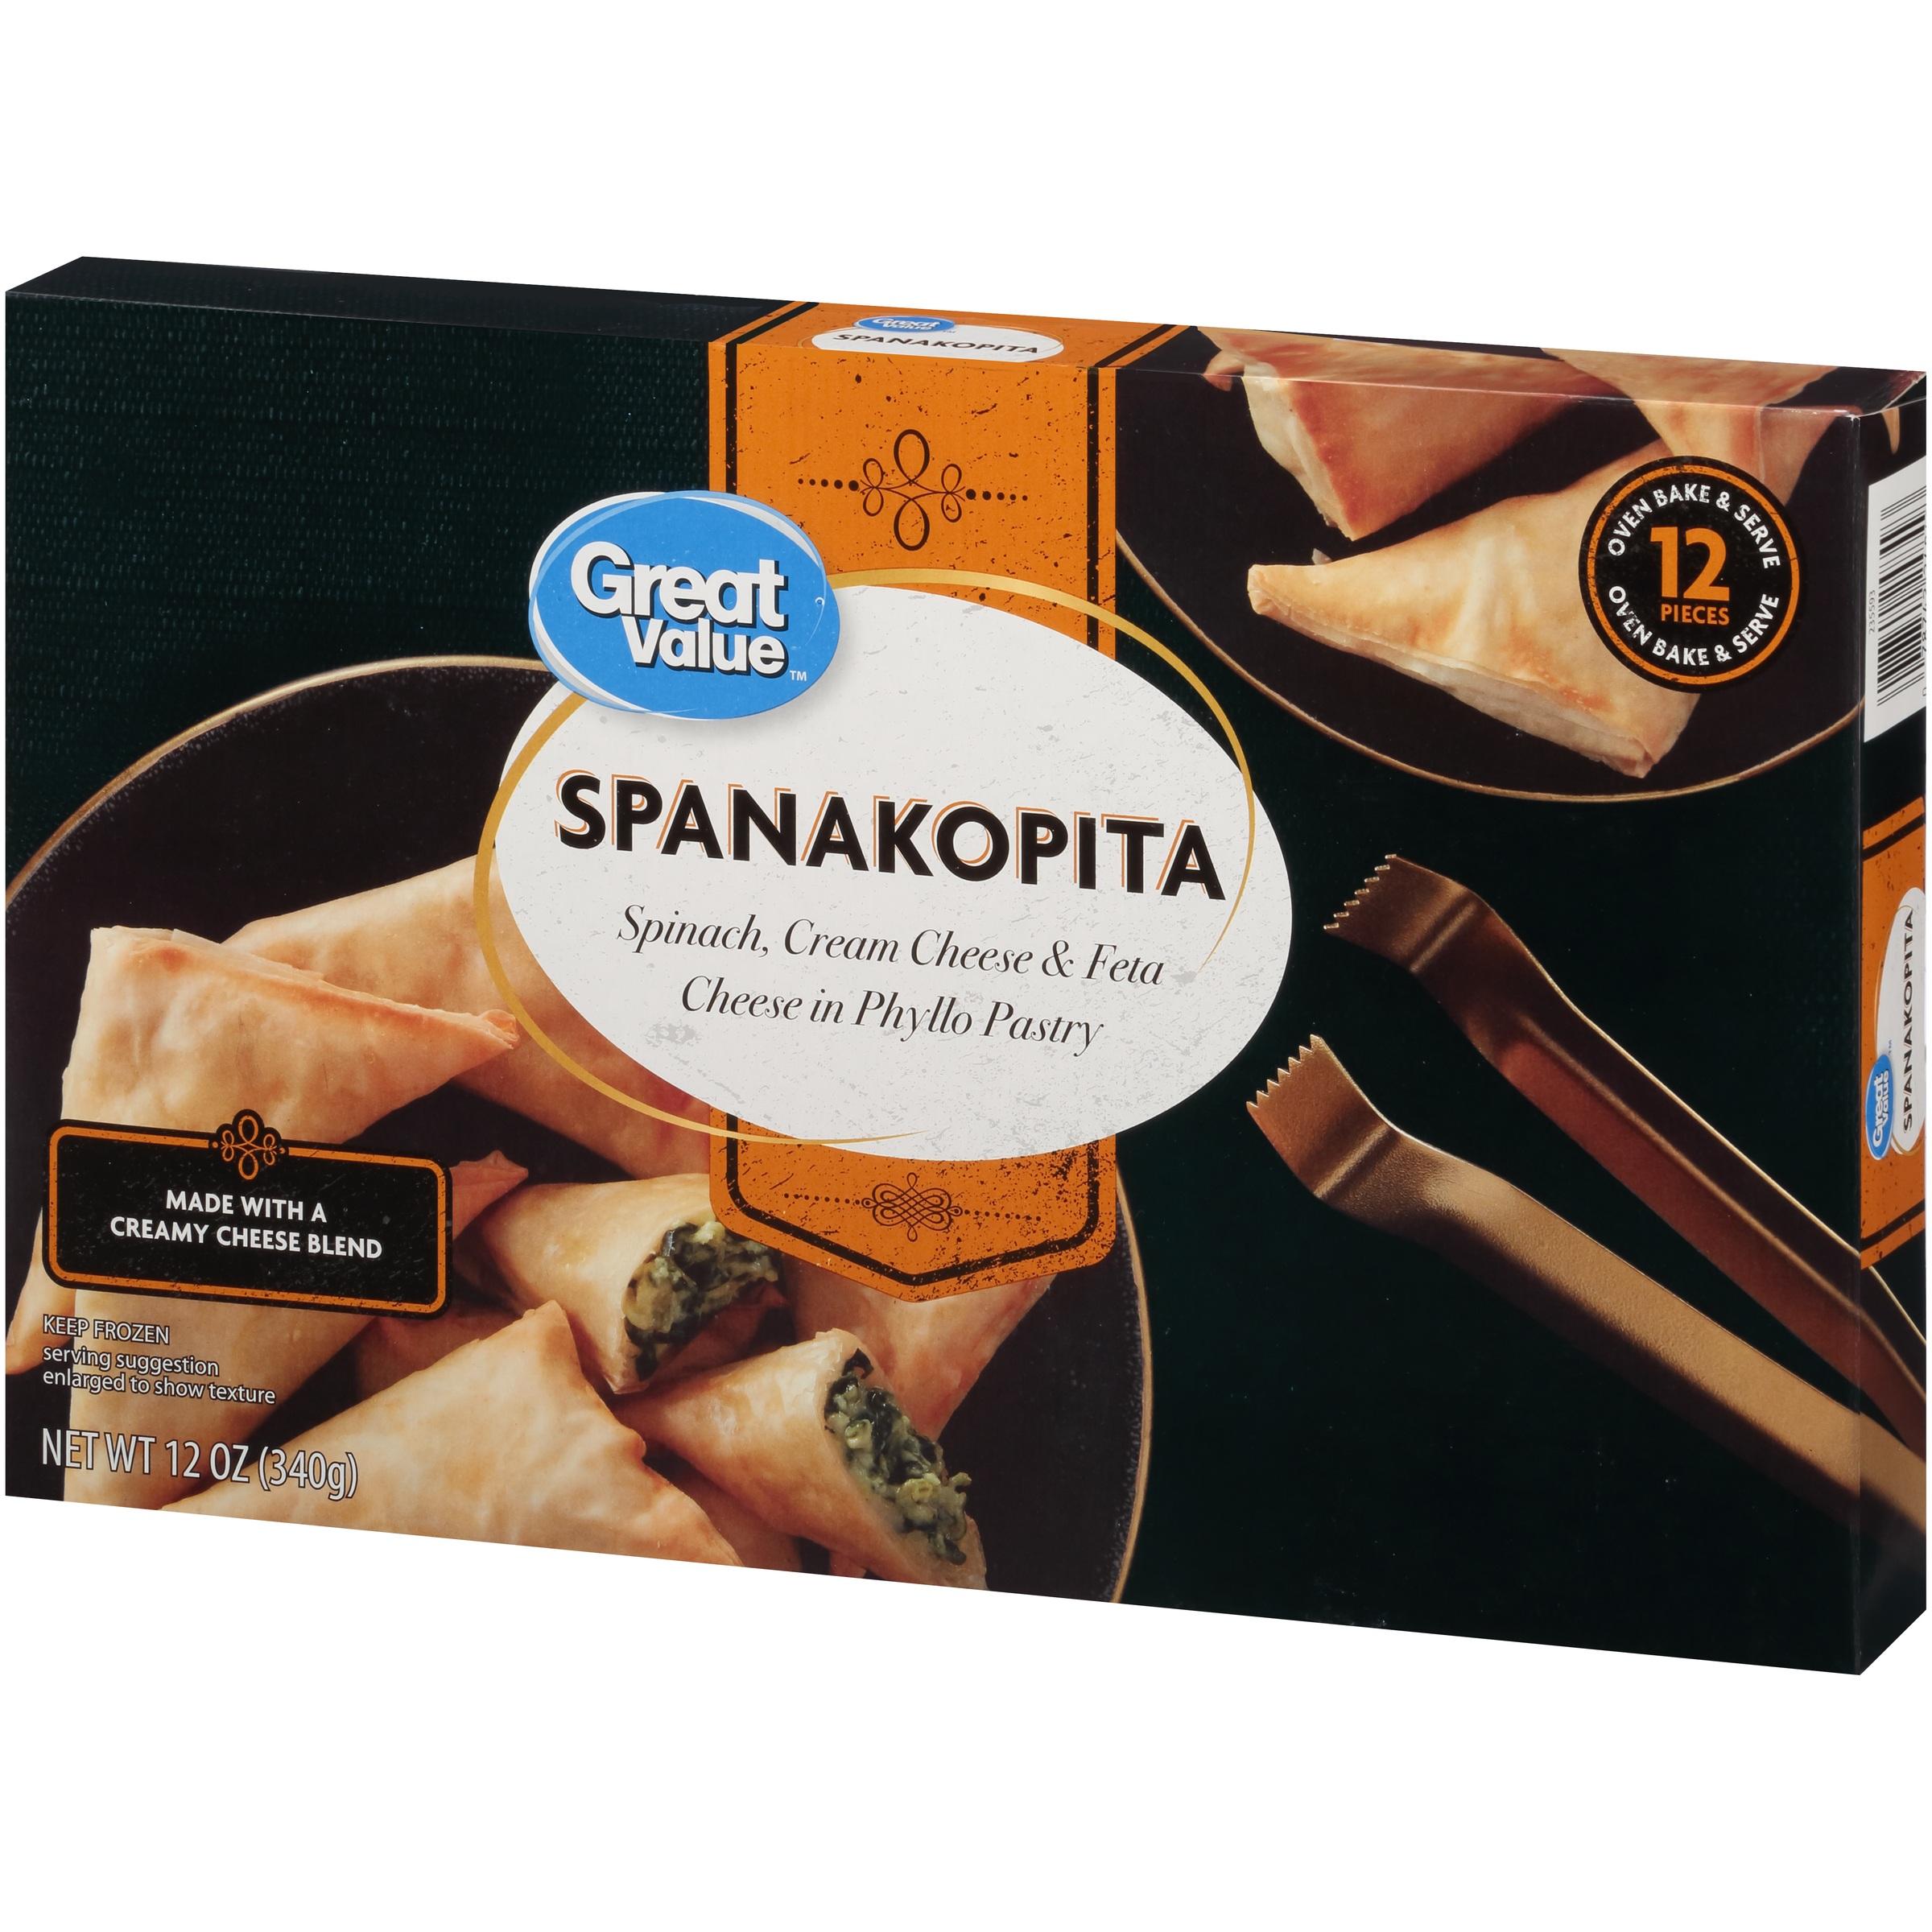 Great Value Frozen Spanakopita, 12 oz, 12 Count